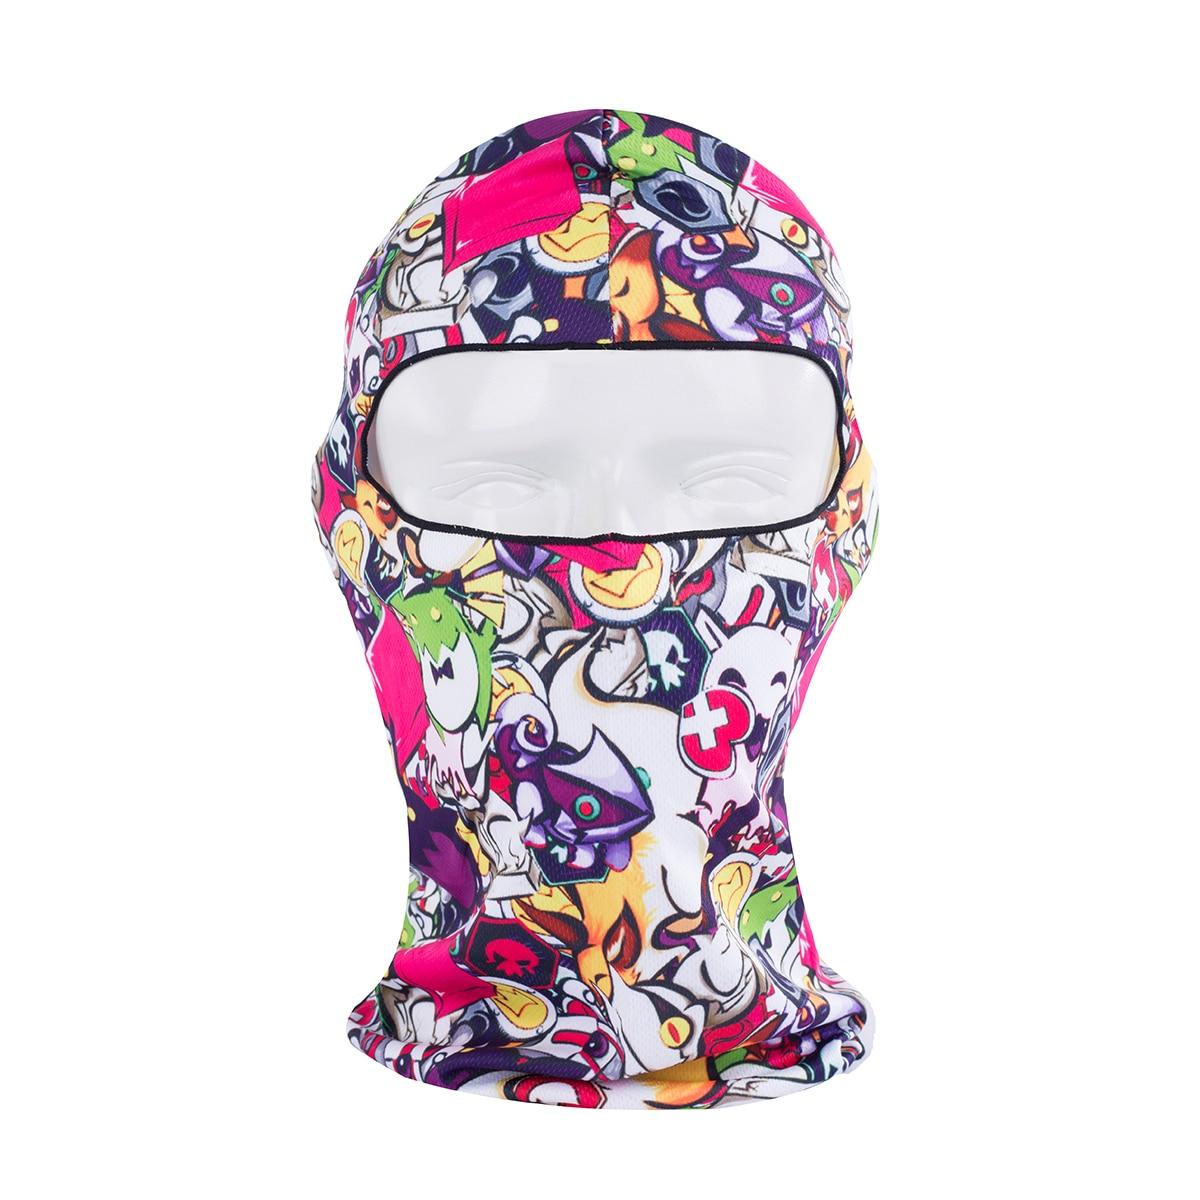 2017 Spring Sport Cycling Motorcycle Mask 3D Animal Active Outdoor Ski Hood Hat Veil Balaclava UV Protect Face Skull Ski Mask